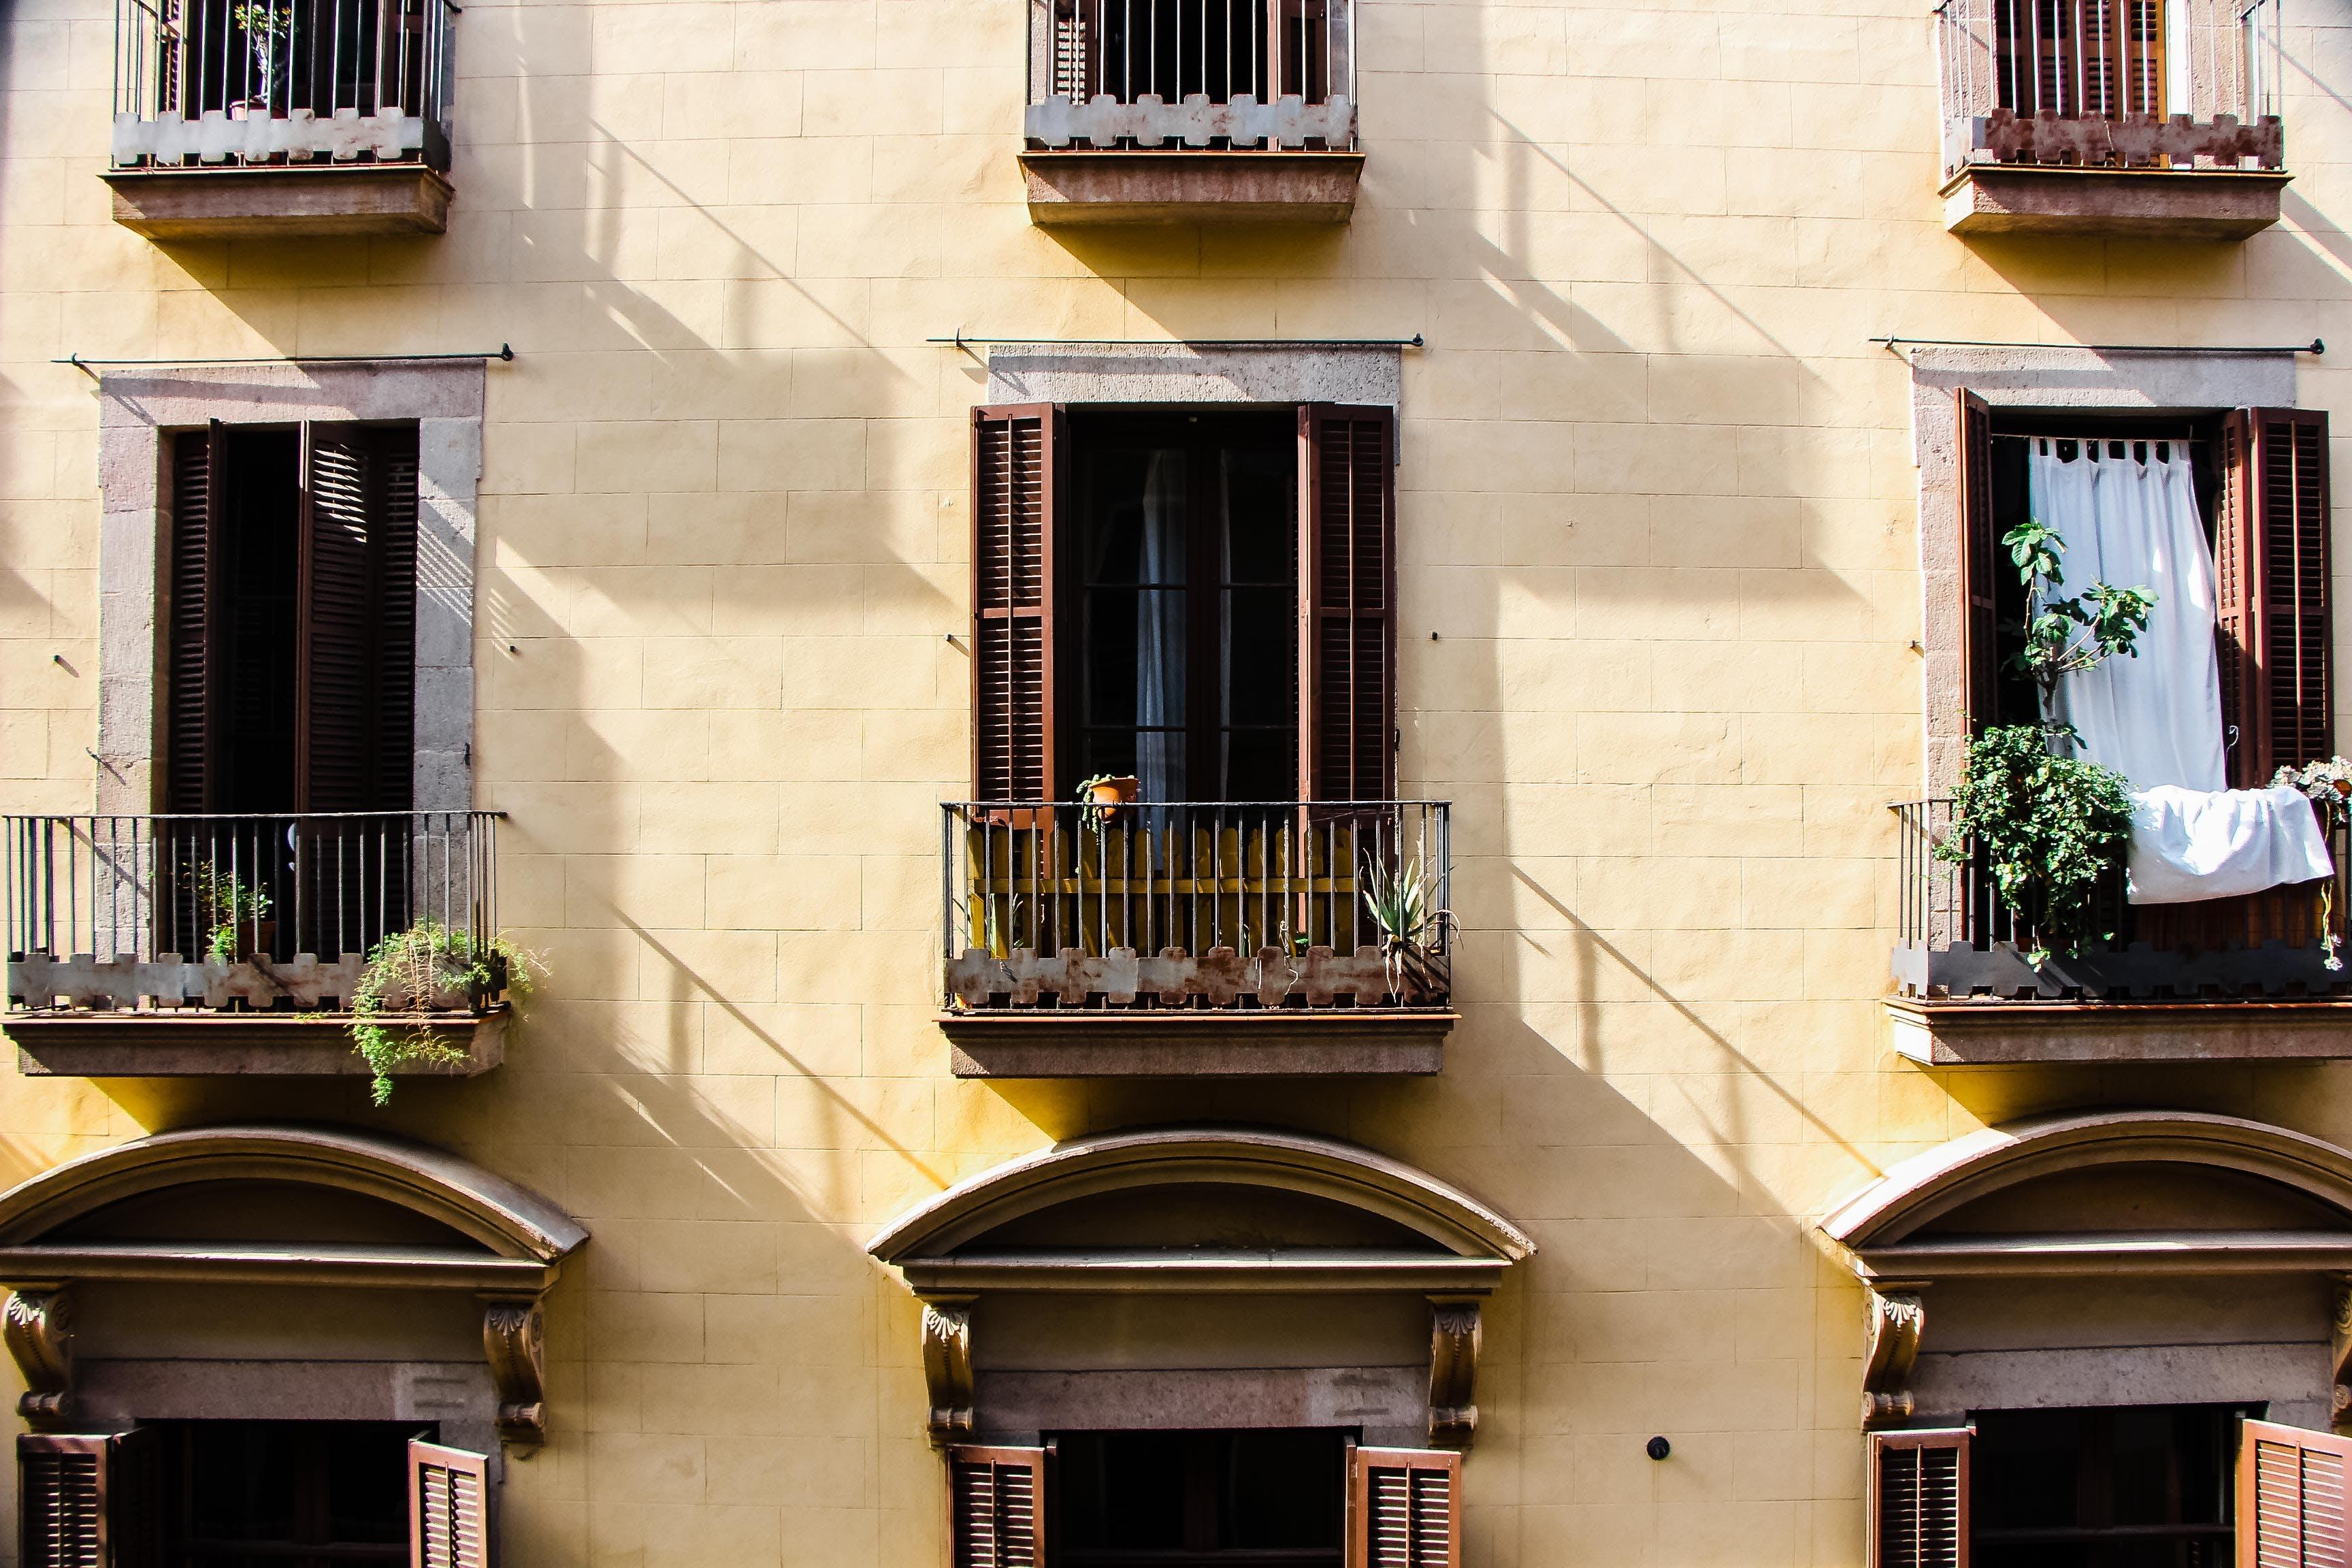 Gratis lagerfoto af arkitektur, balkon, bygning, døre